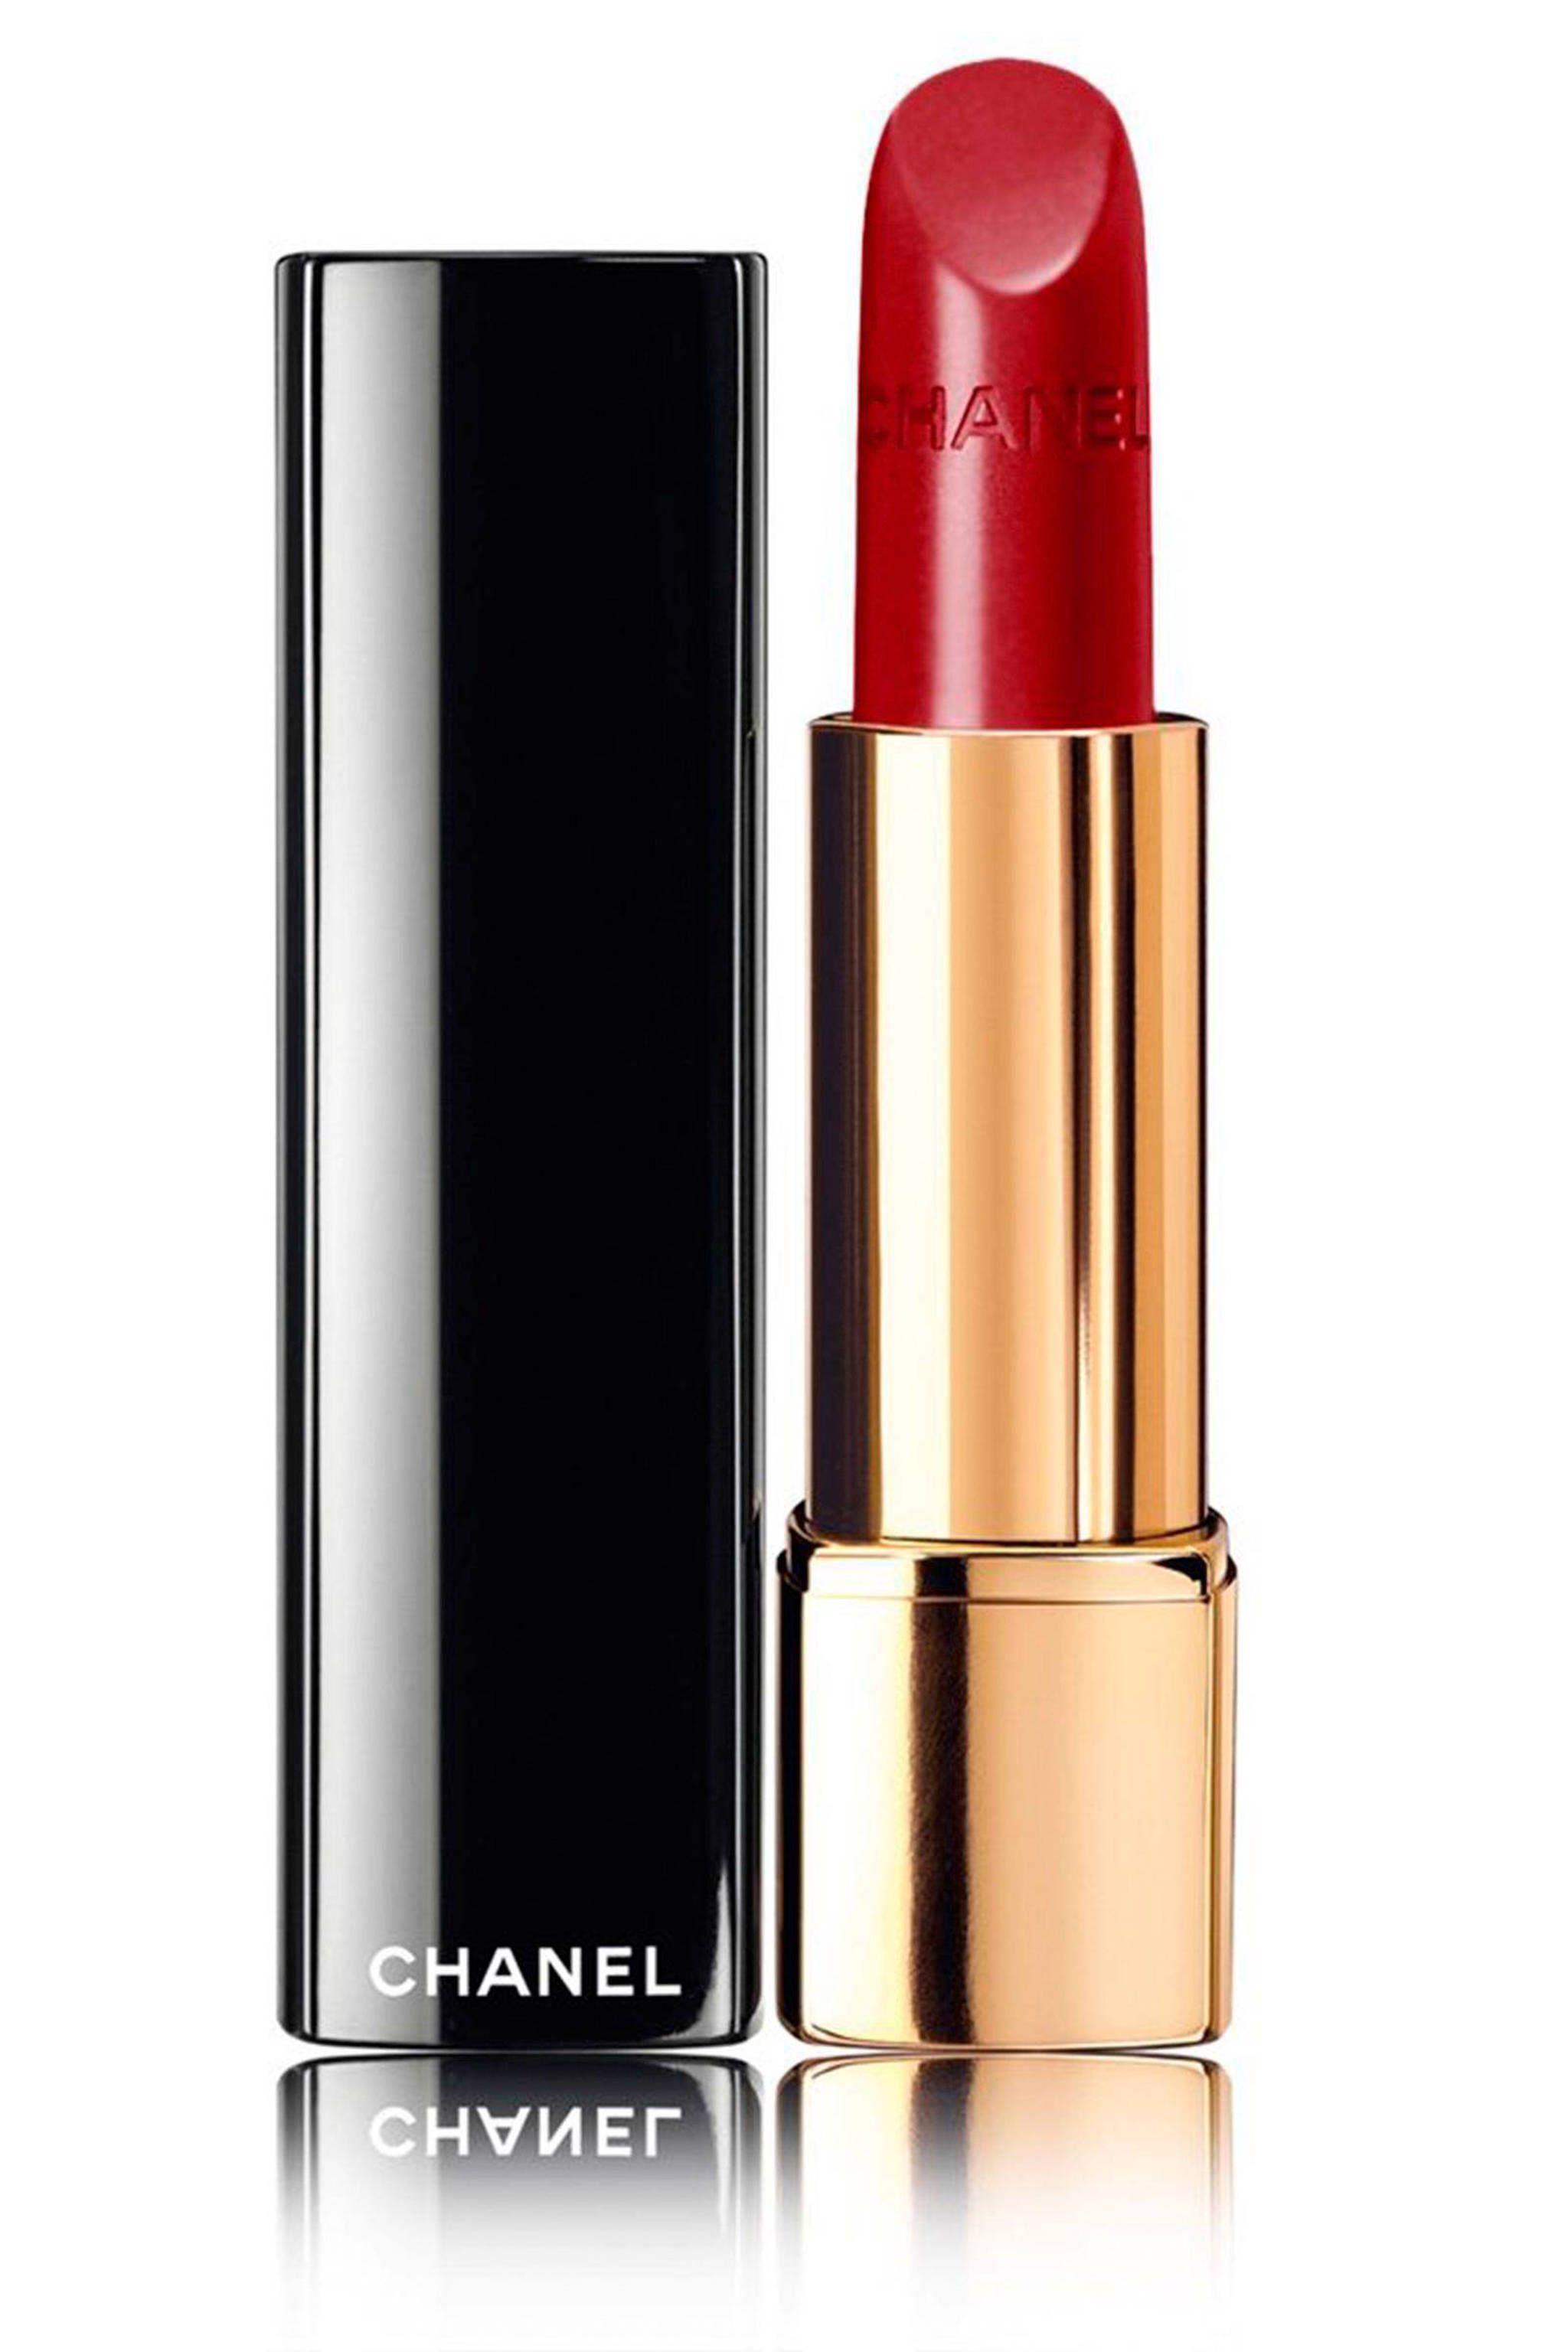 Chanel-lippenstift-rouge-allure-PIRATE